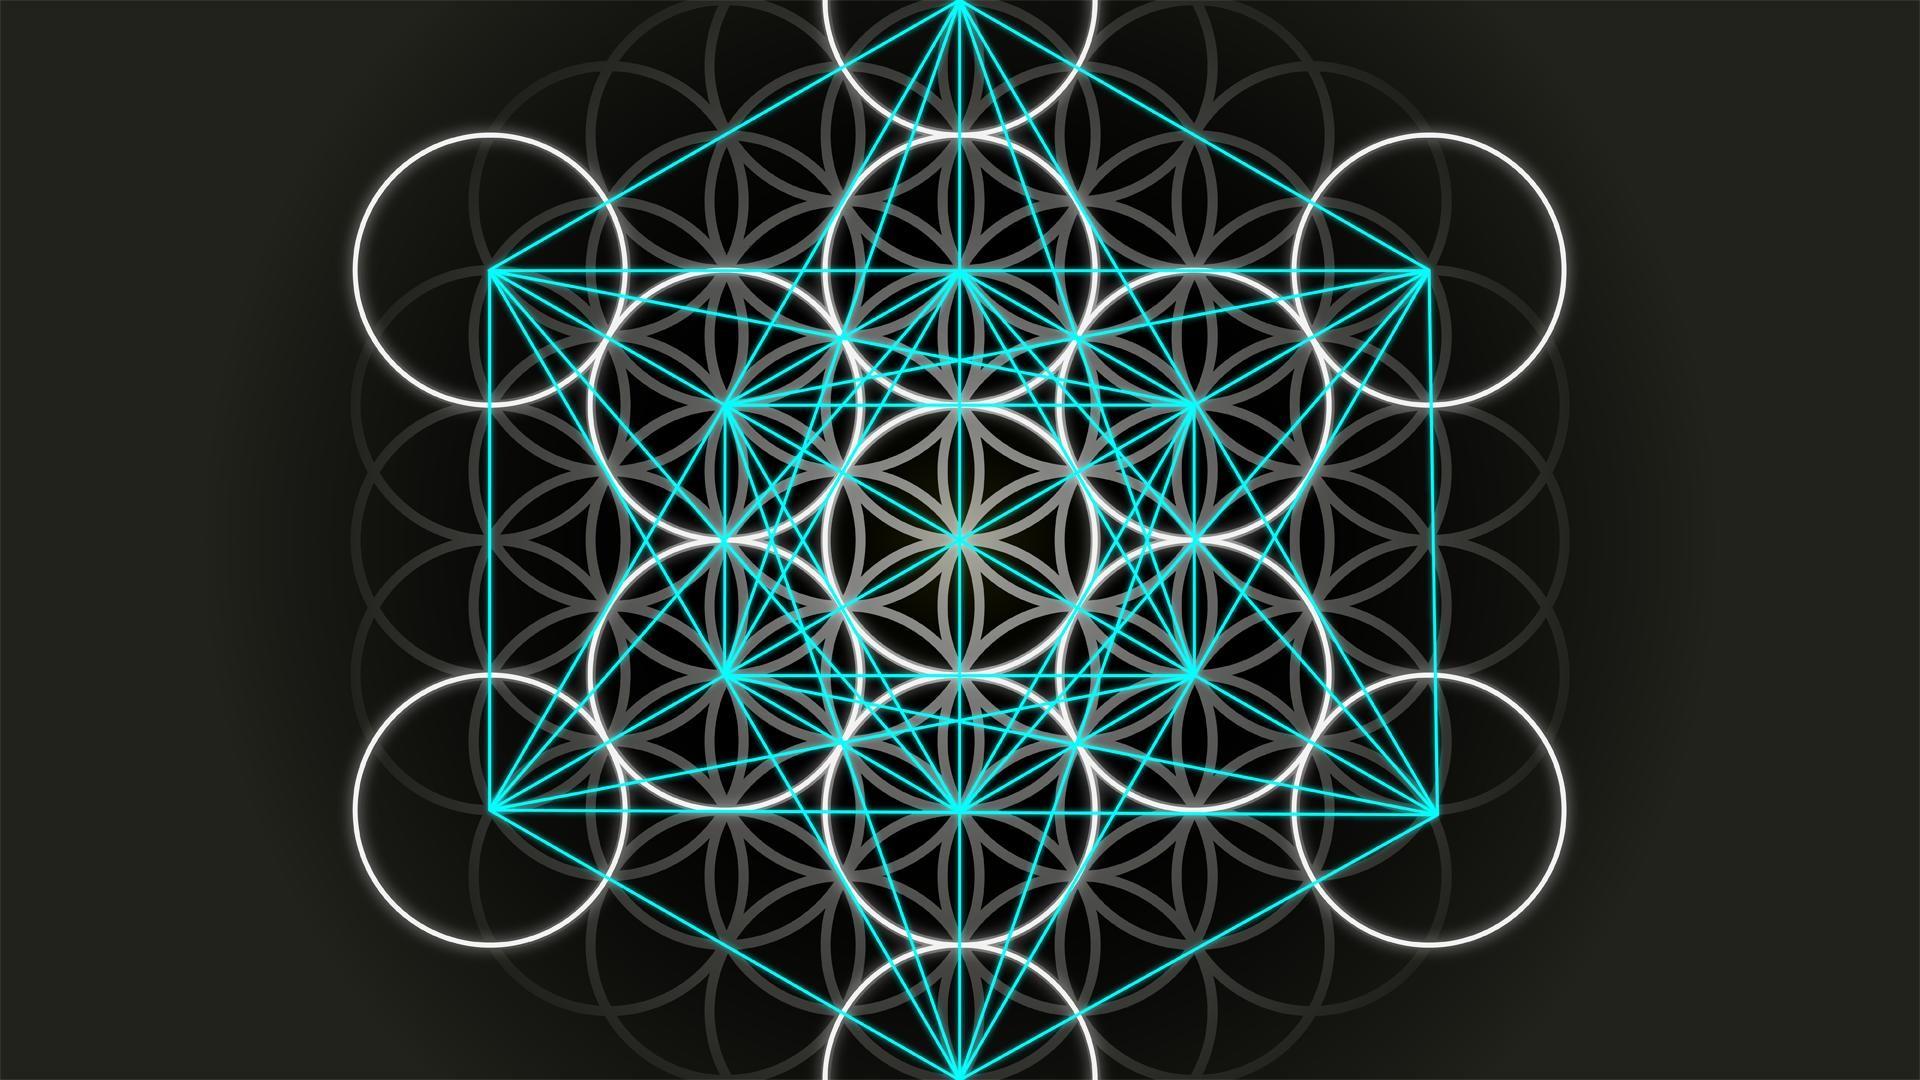 Sacred Geometry Flower Of Life Wallpaper Pretty sweet wallpaper of